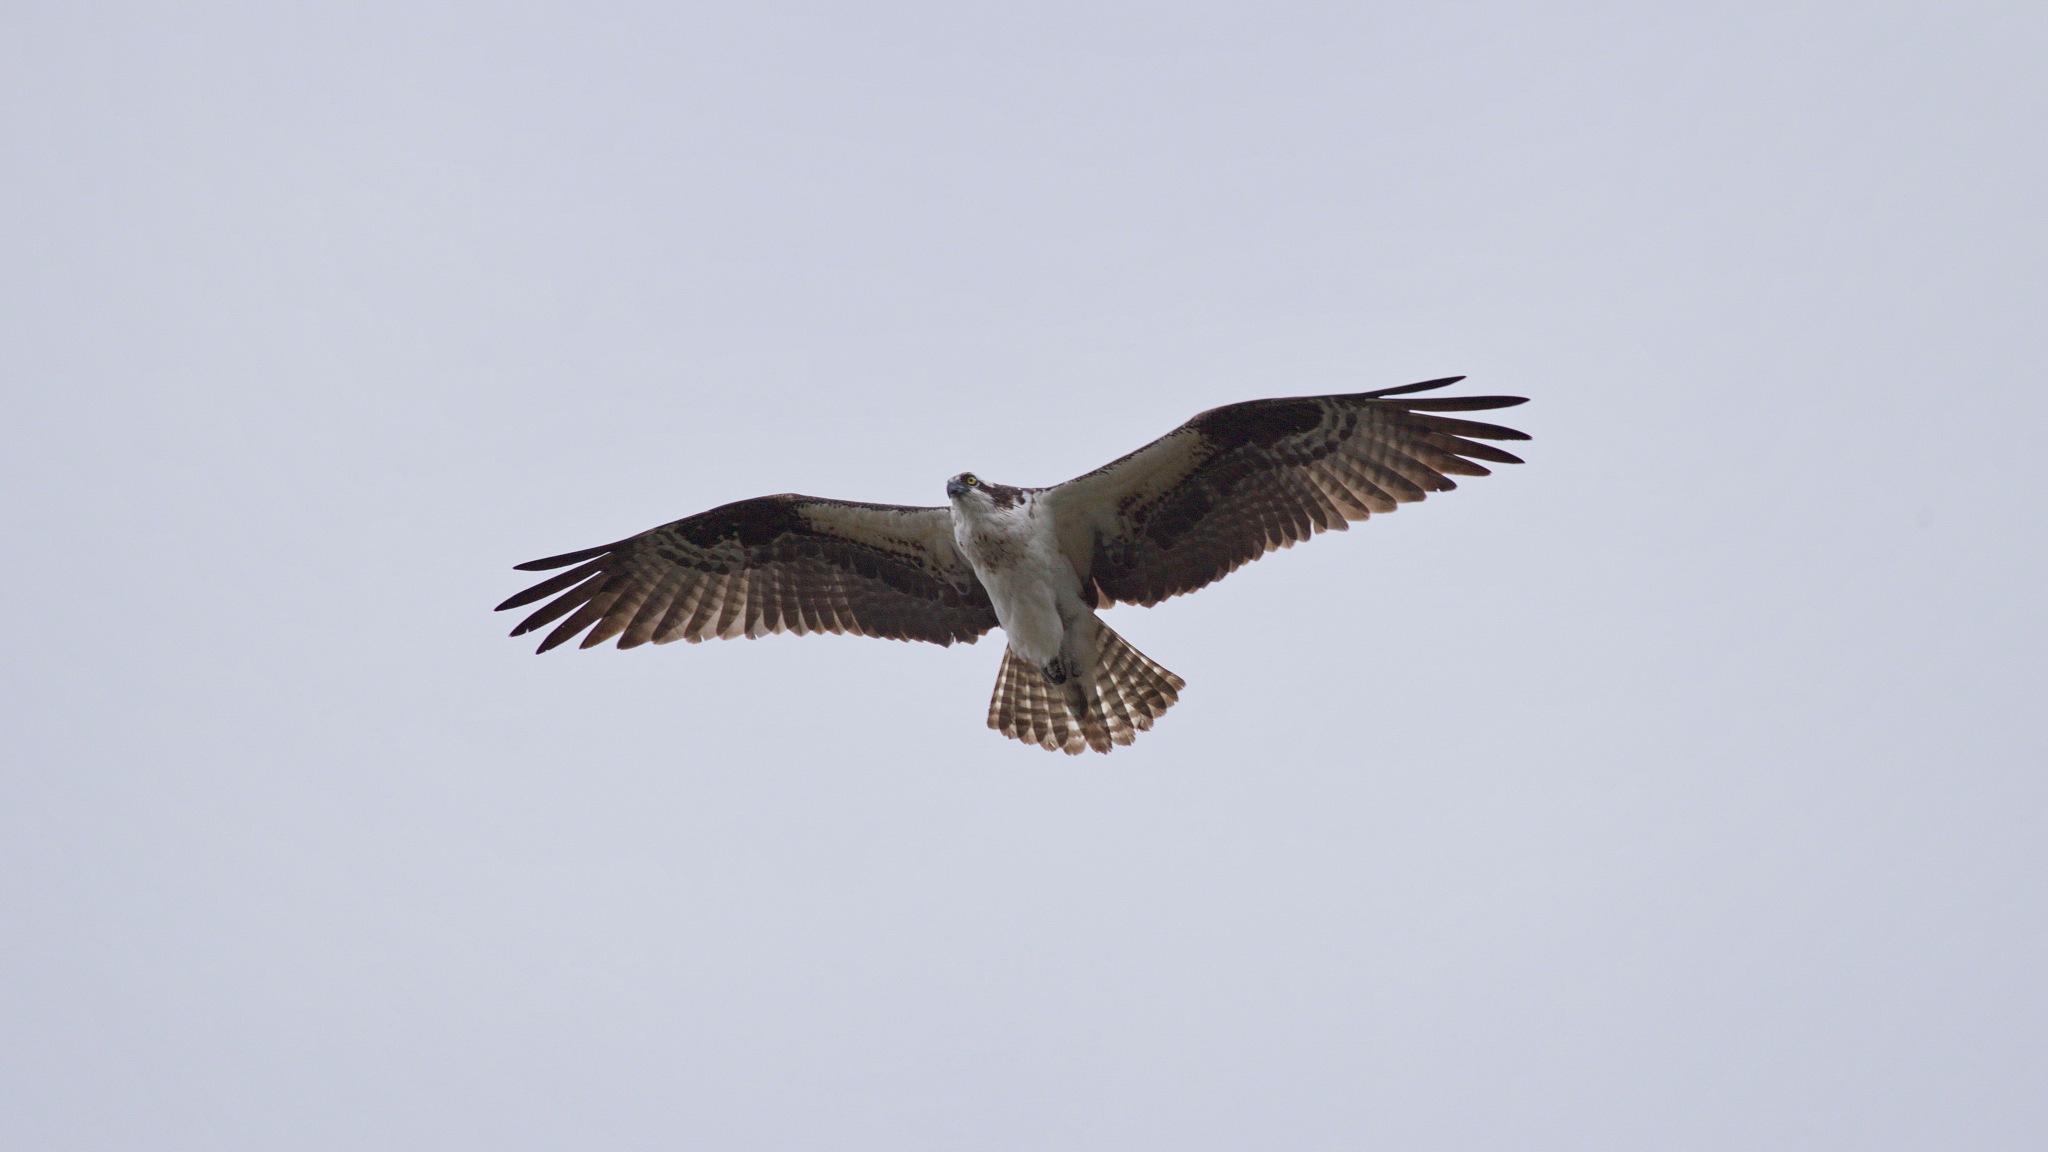 Osprey by daniel.luna.77920